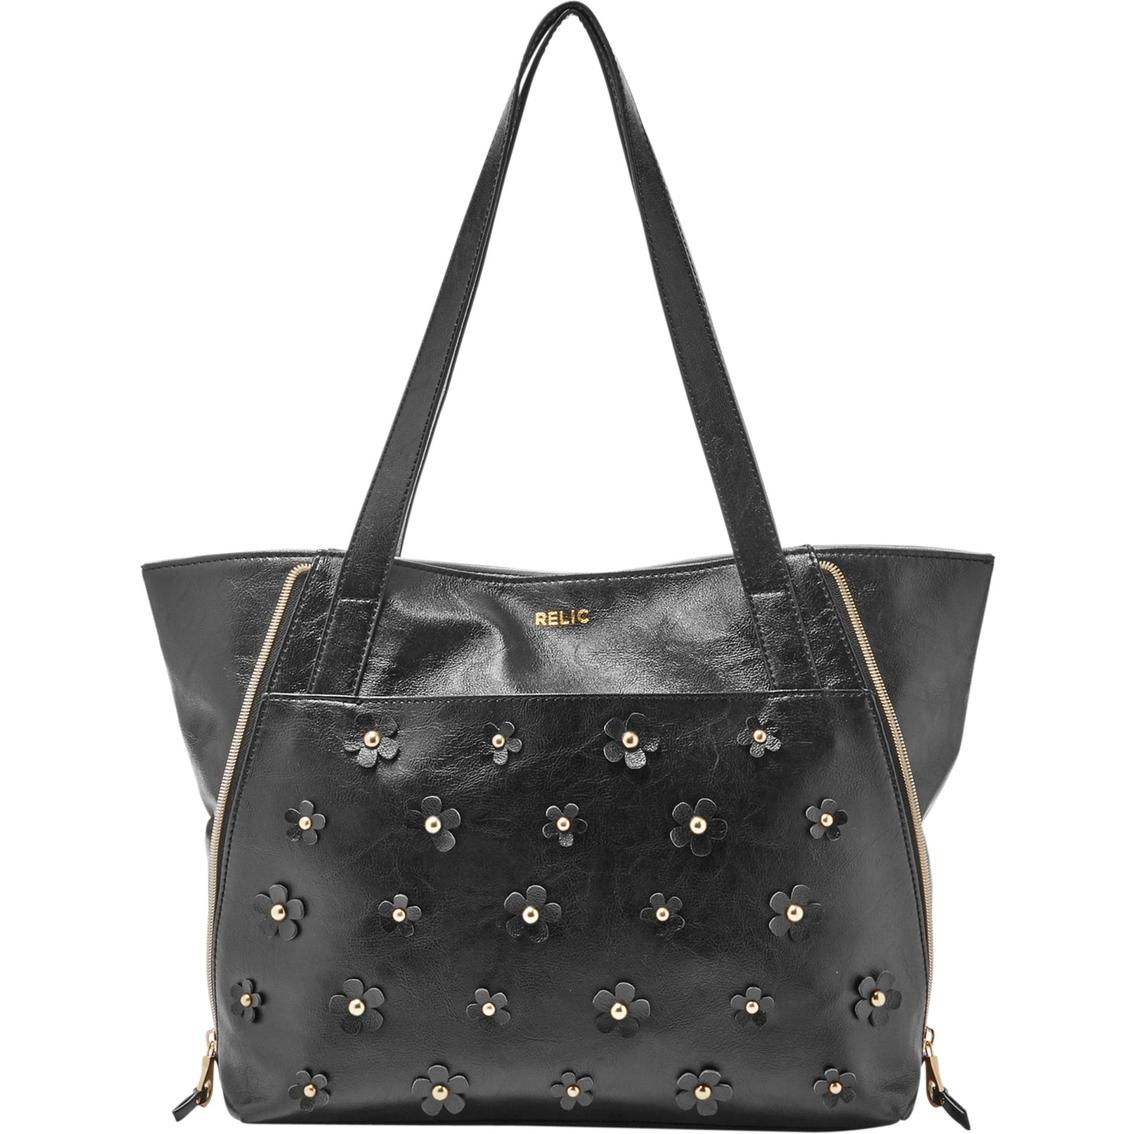 49cf313718 Relic Emma Flower Applique Tote Bag